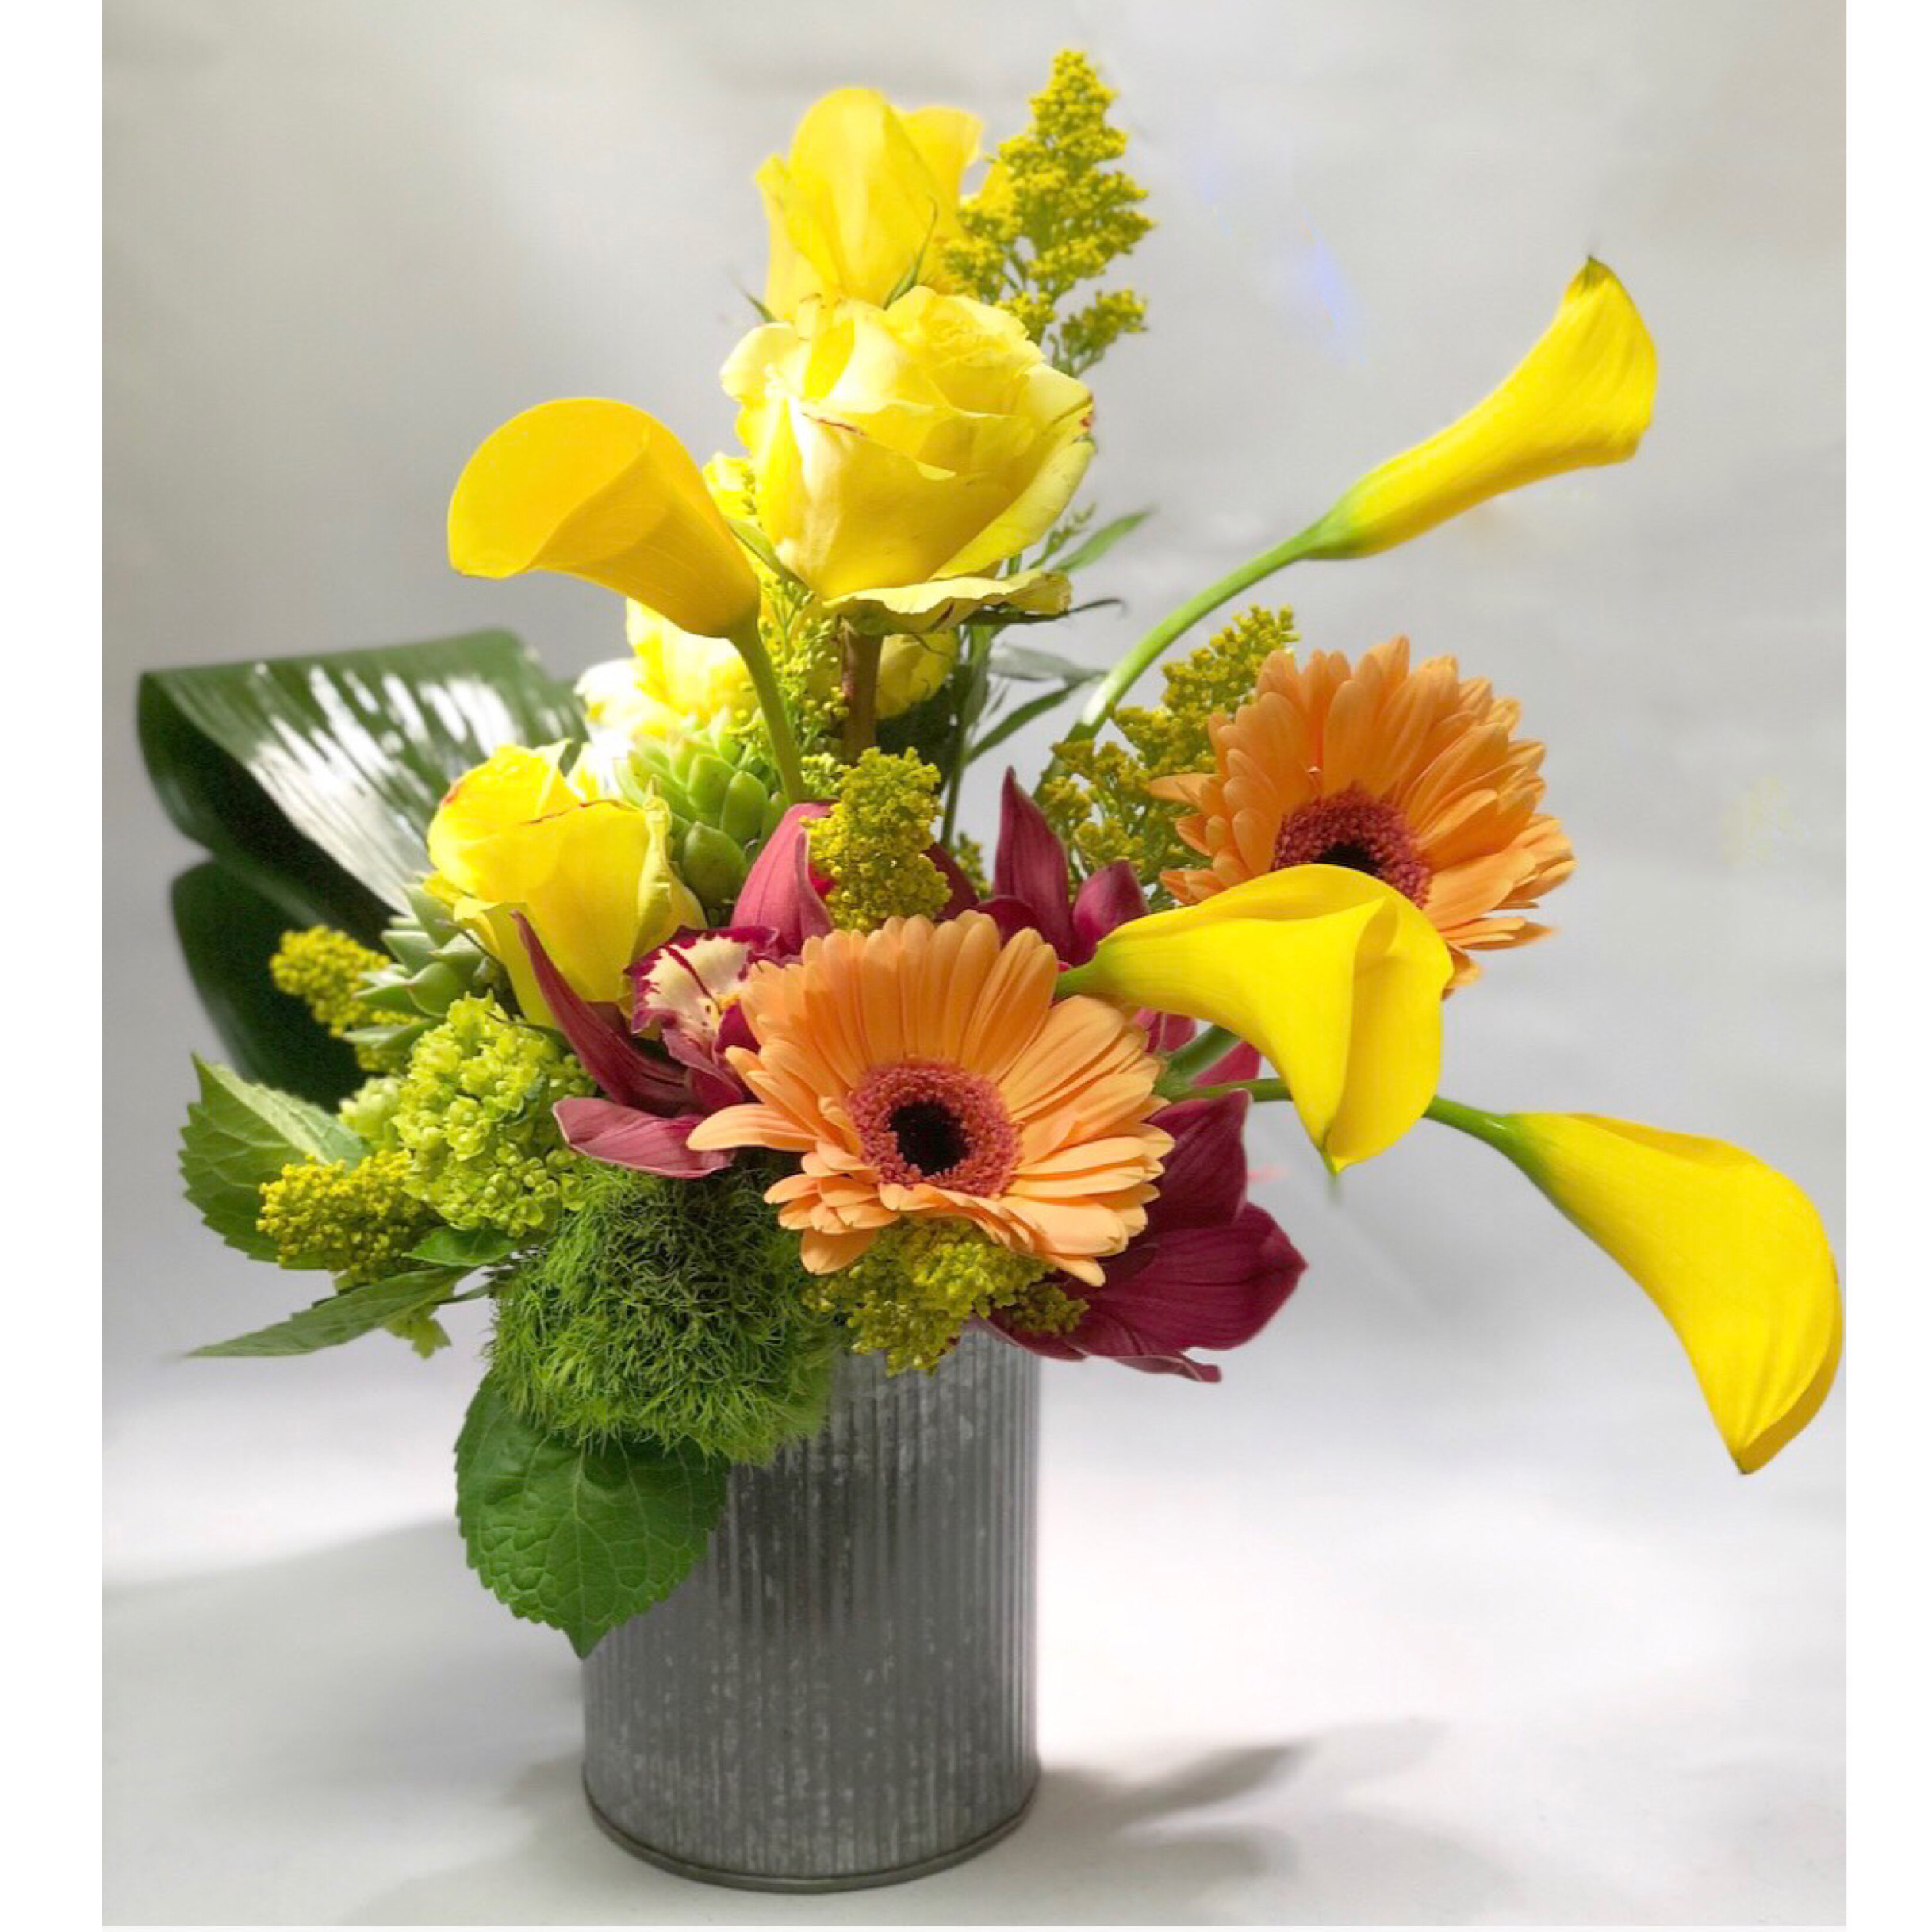 Bloom And Petal Flower Truck 1447 Alford Ave Hoover Al 35226 Yp